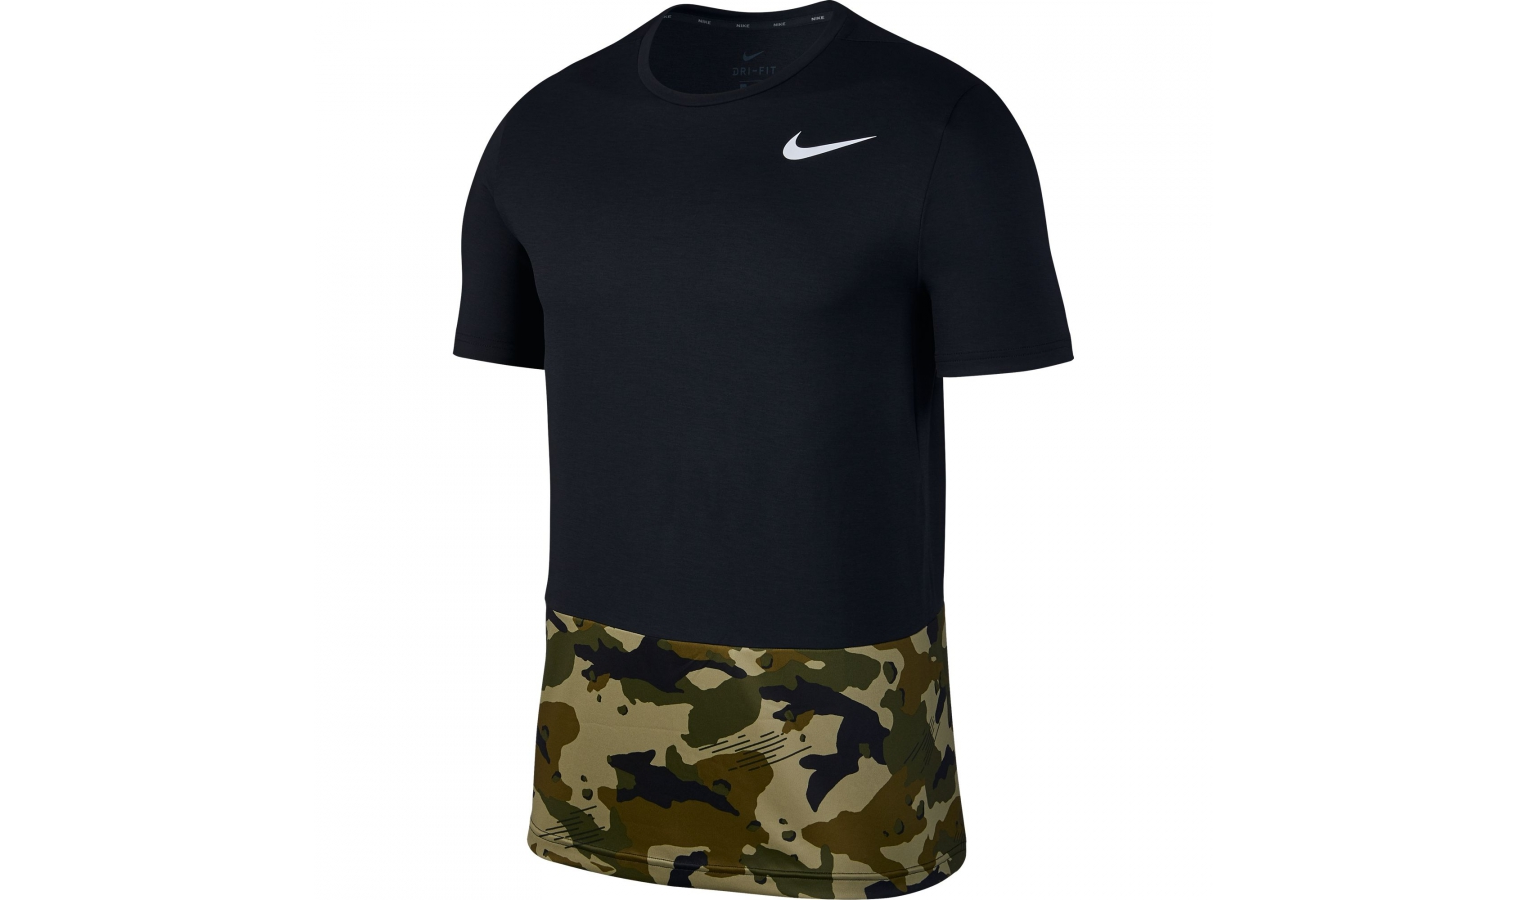 Nike Breathe Negra Rshcdqt Hombre Deportes Camiseta Moya JTK1c3lF